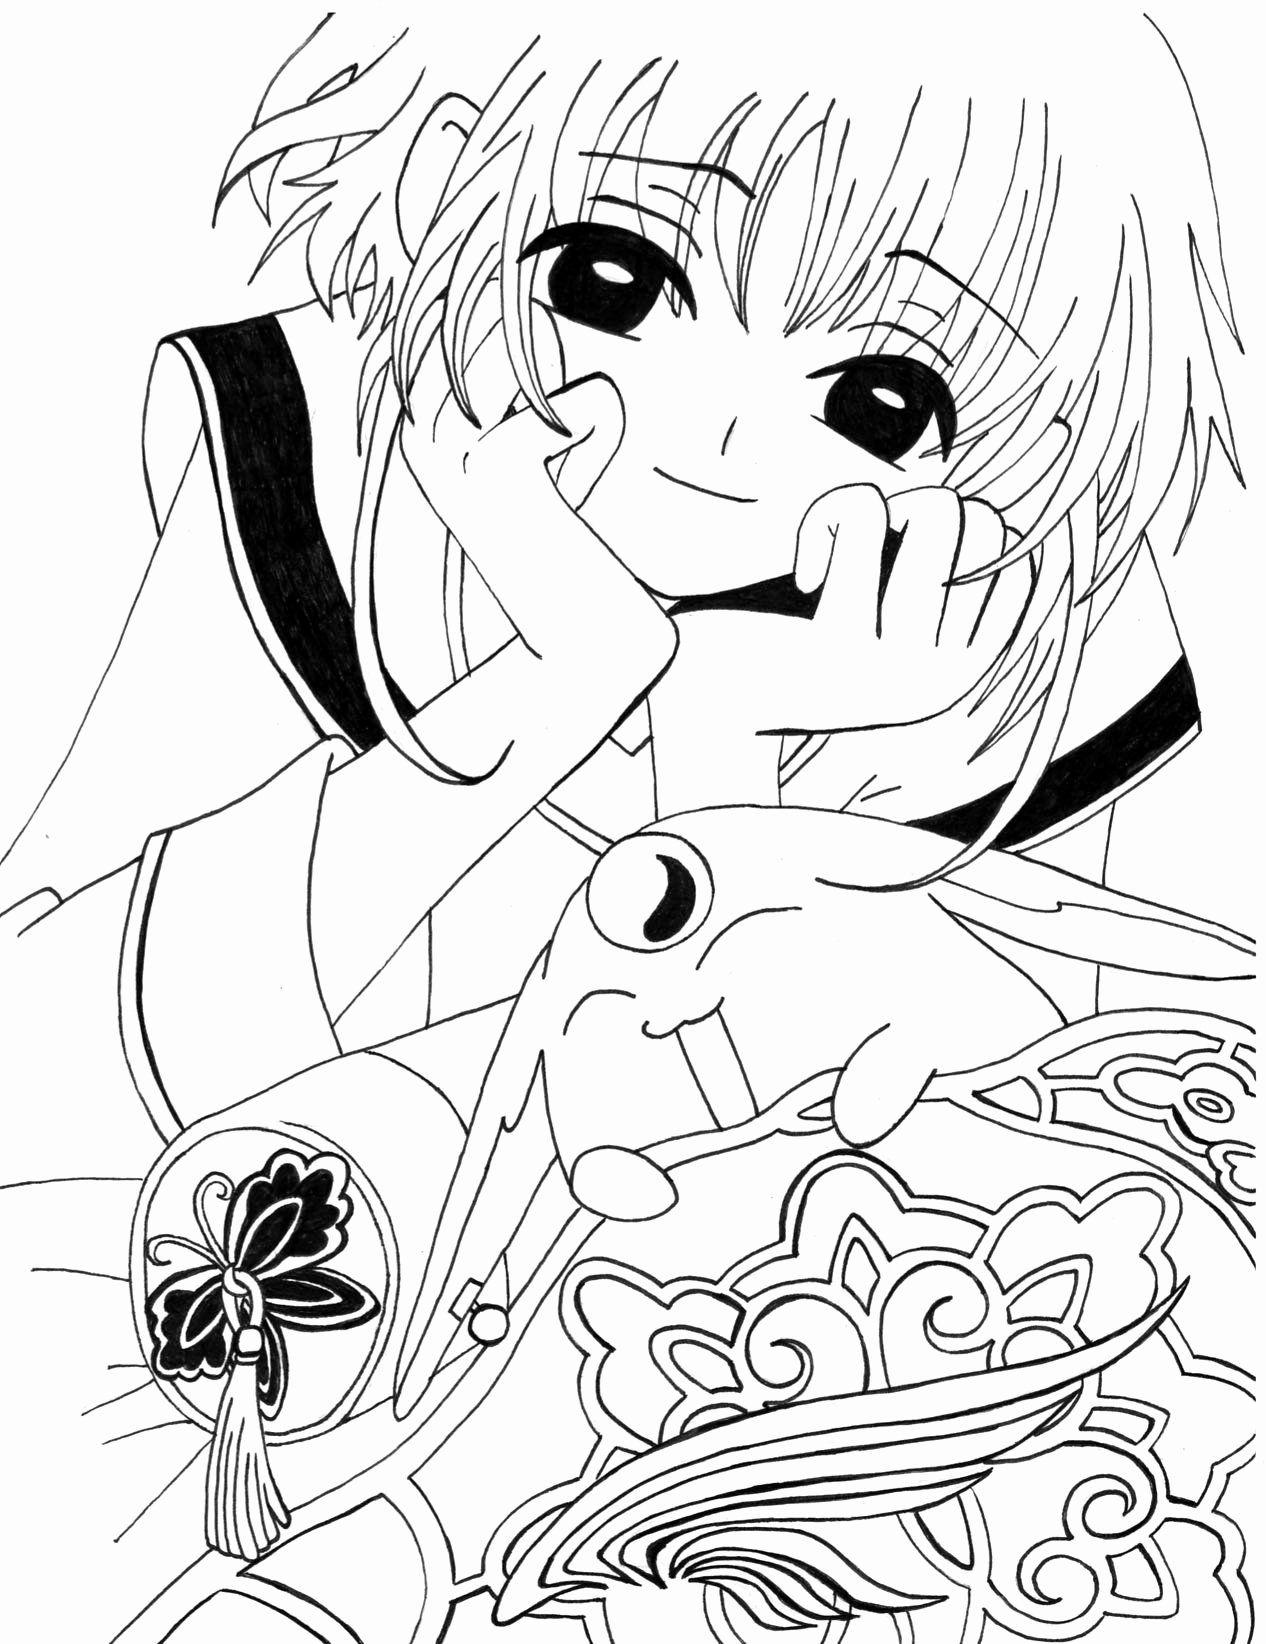 Tsubasa Reservoir Chronicle Anime Coloring Pages Printable Inspirational Tsubasa Resevoir Chronicles By Layna2007 On D Anime Coloring Pages Tsubasa Chronicles [ 1644 x 1266 Pixel ]